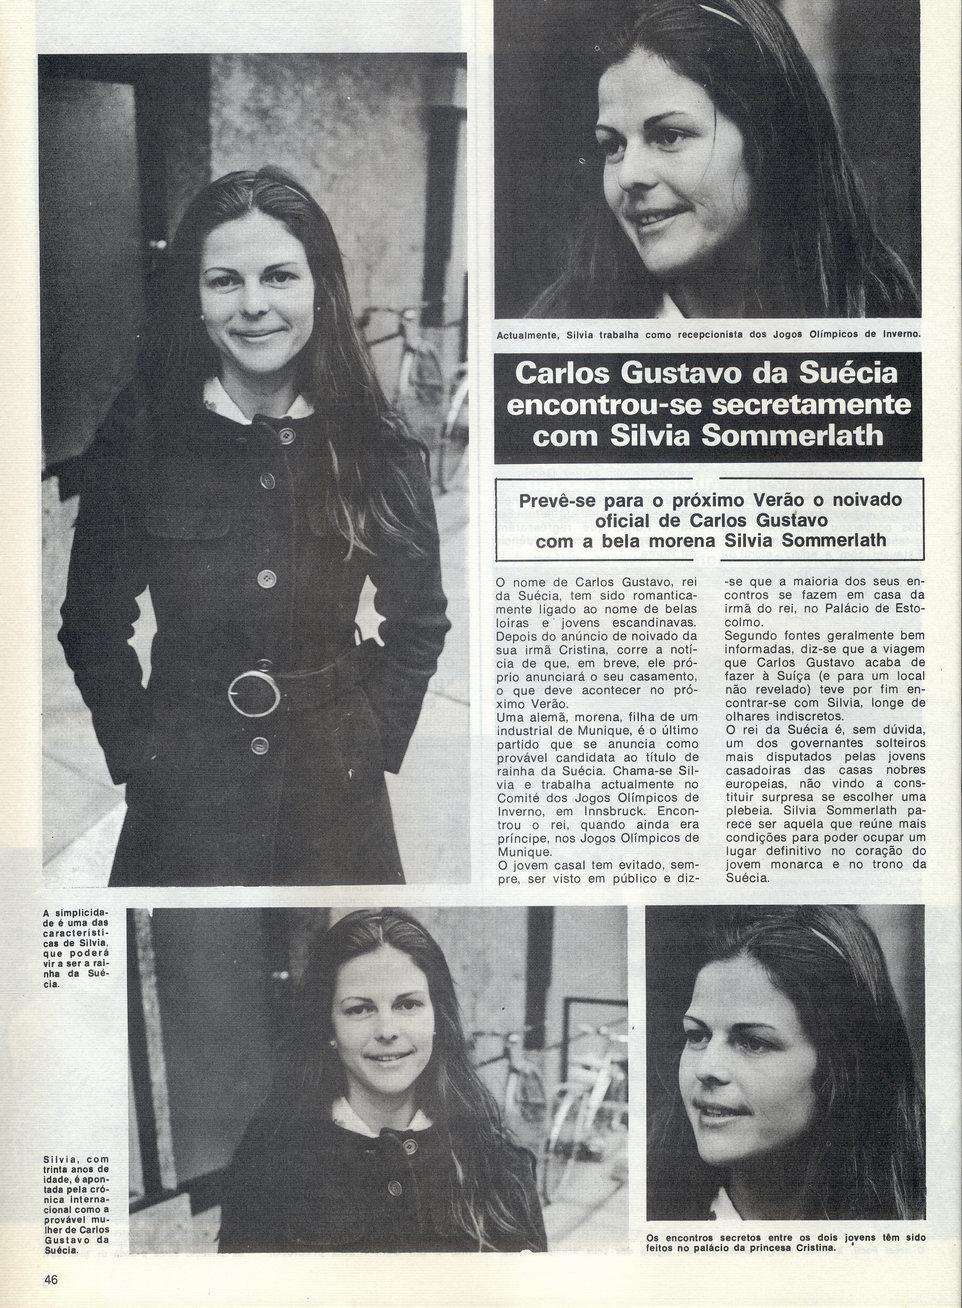 Silvia Sommerlath, reina de Suecia 558513908_19bede3c26_o